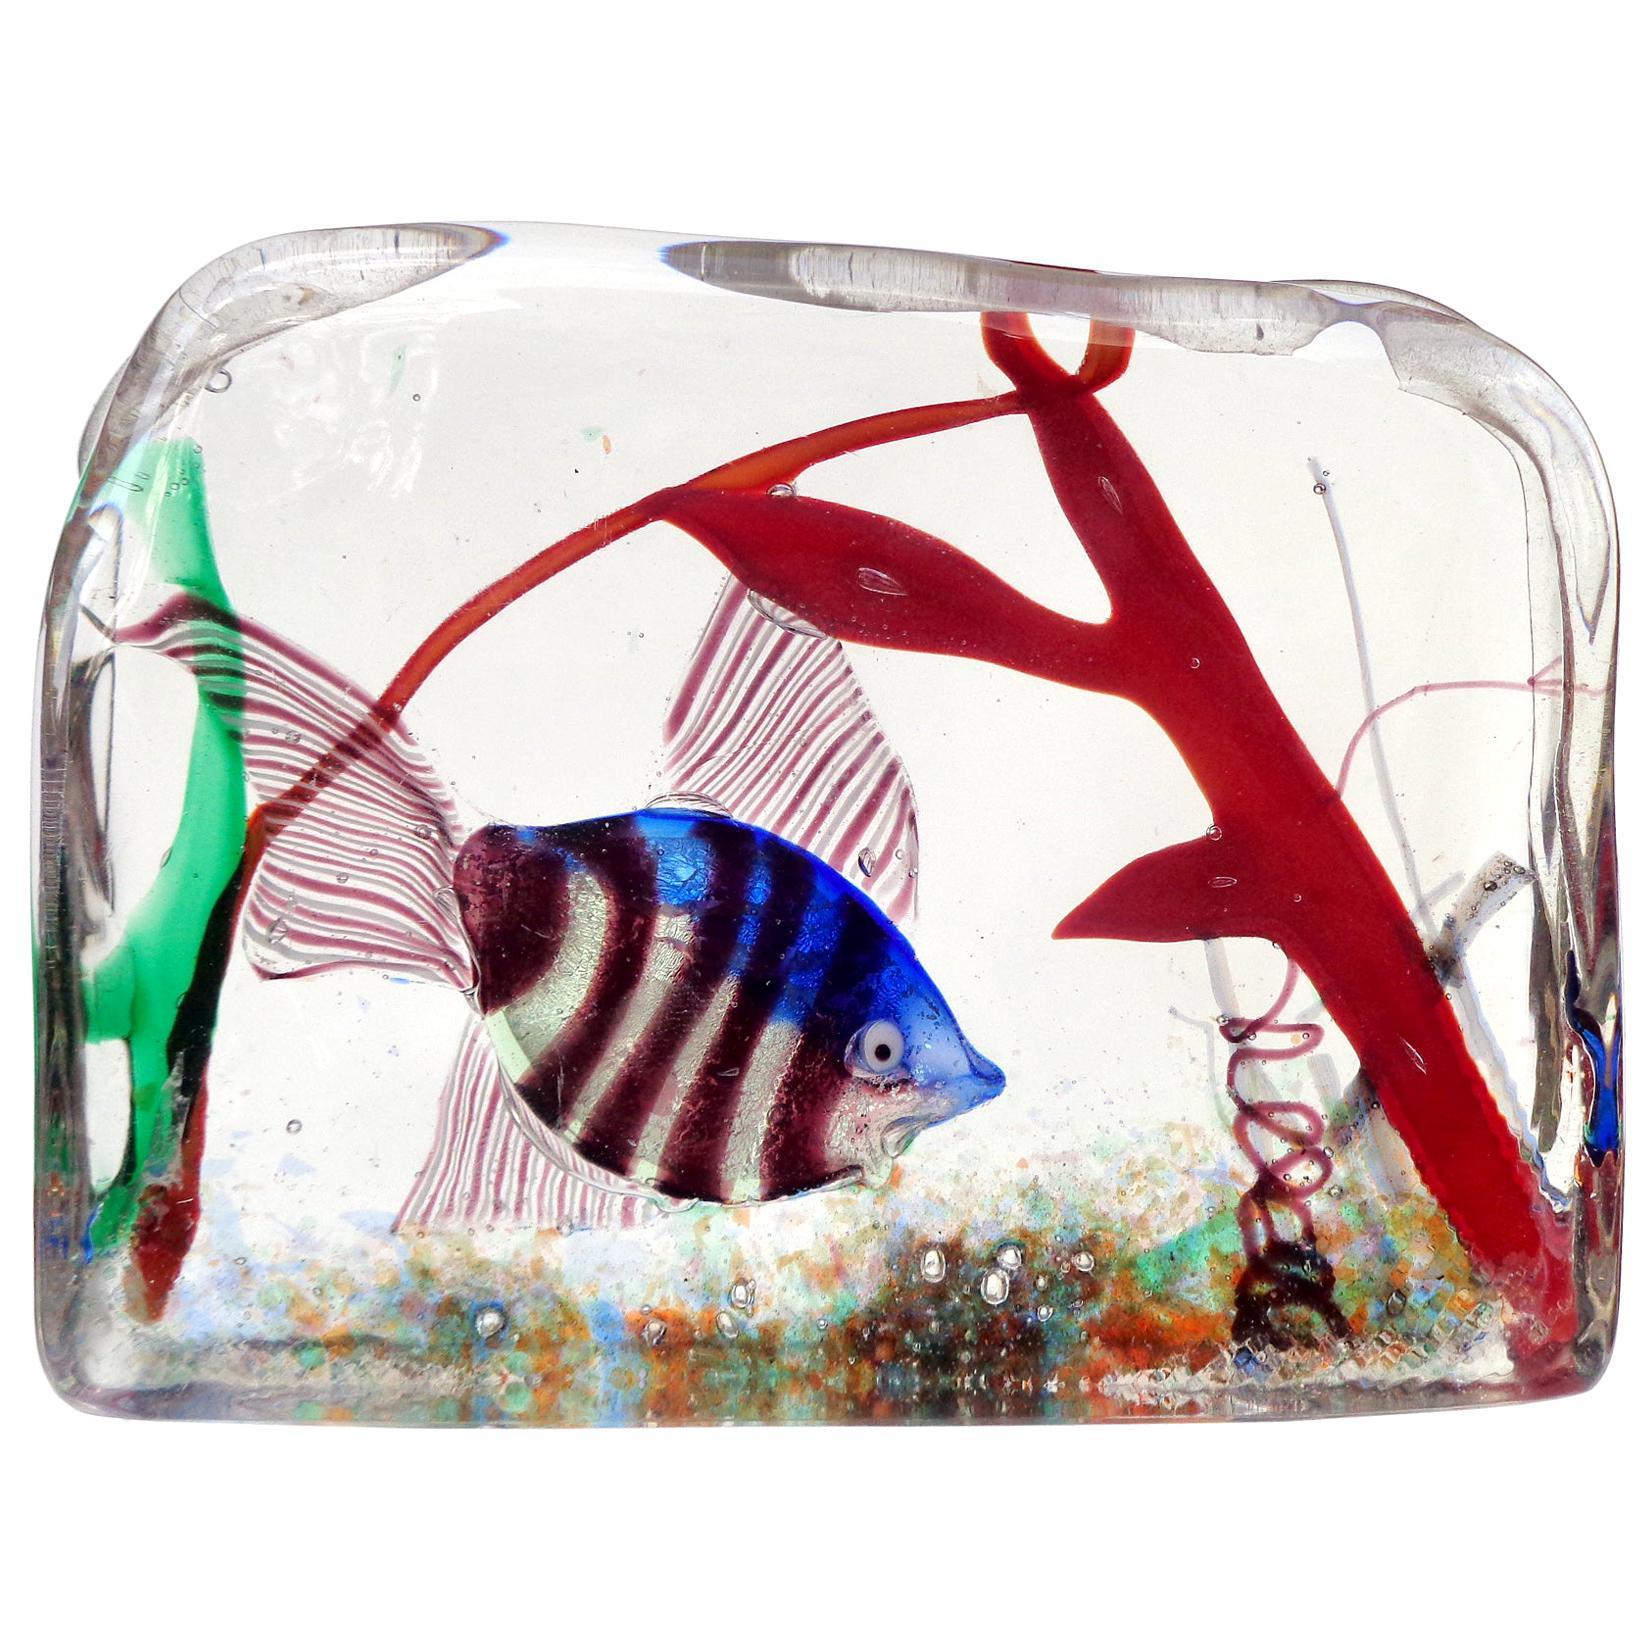 Murano Silver Striped Fish and Coral Italian Art Glass Aquarium Block Sculpture